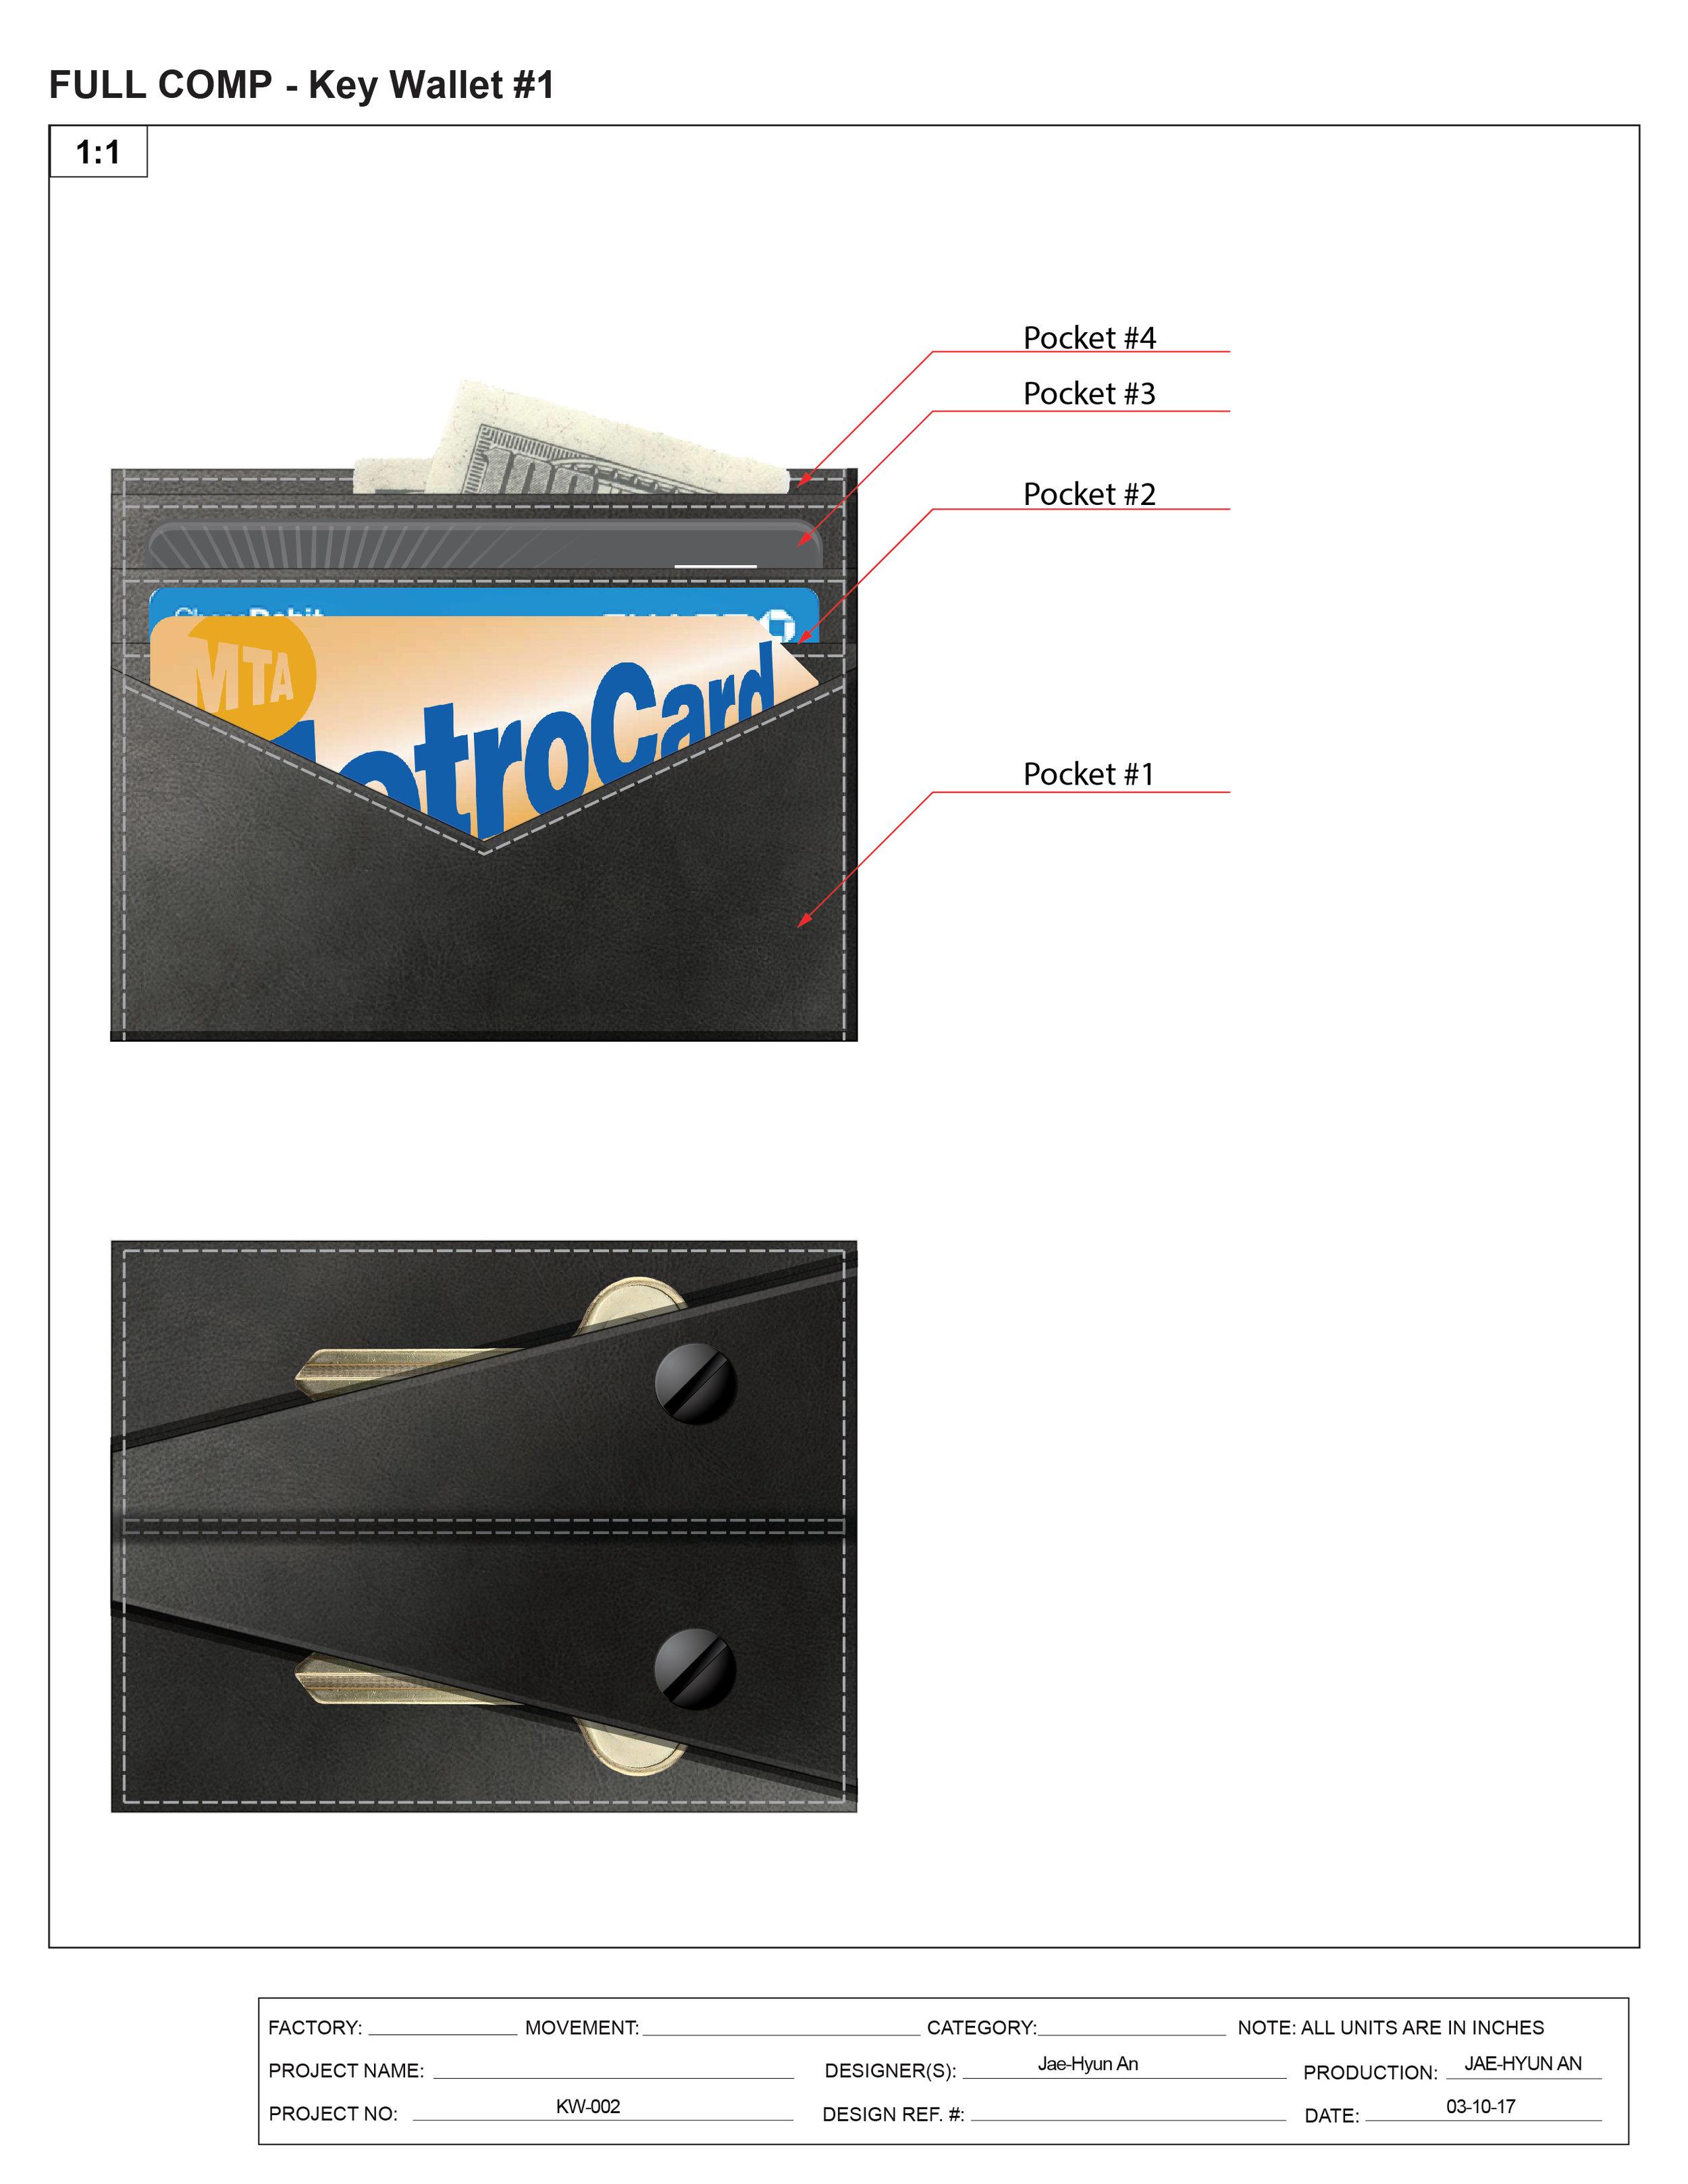 Key Wallet # 2SPECs and MECHANICALS-01.jpg